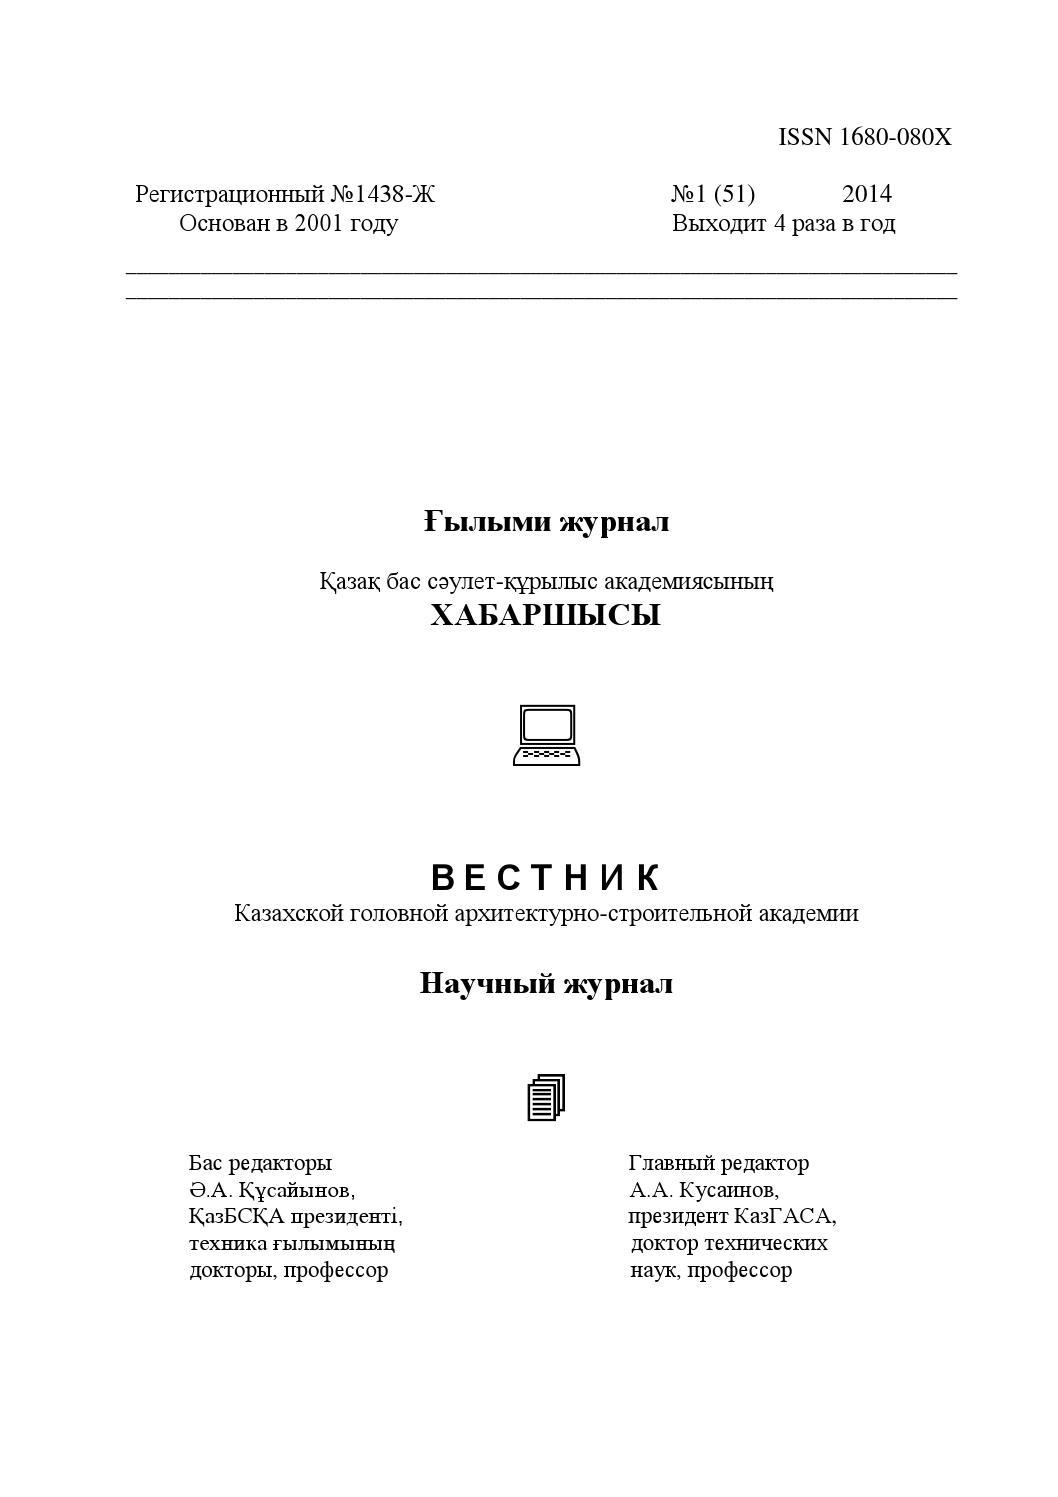 ПЕНОПЛЭКС®КОМФОРТ,ТК